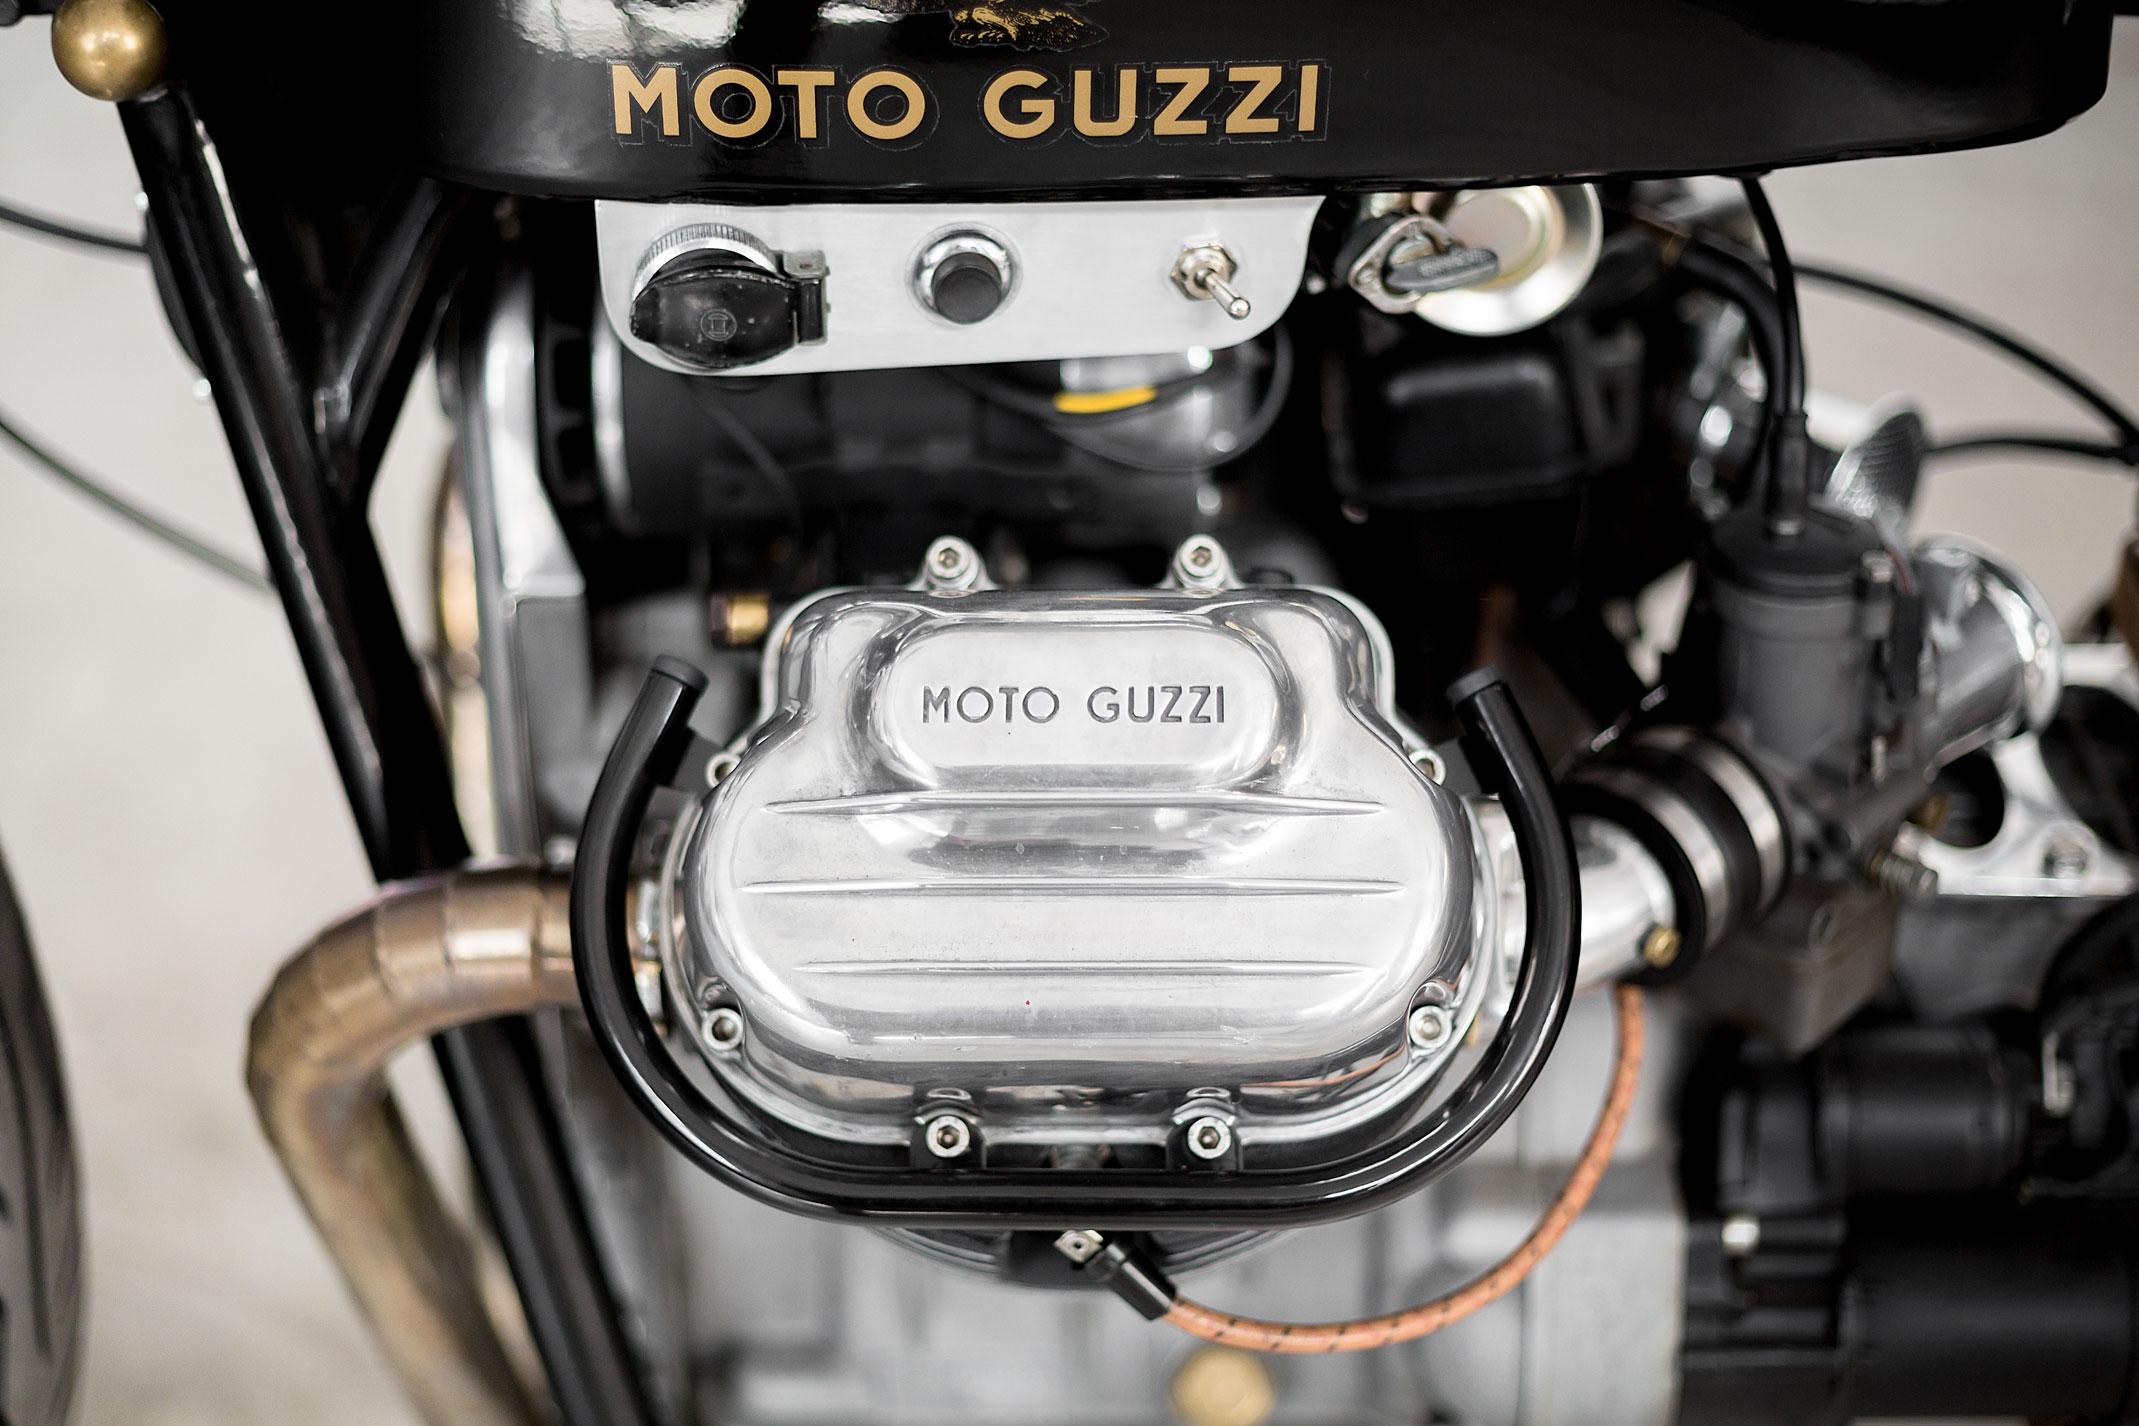 Route Fiere, vintage Moto Guzzi V7 engine